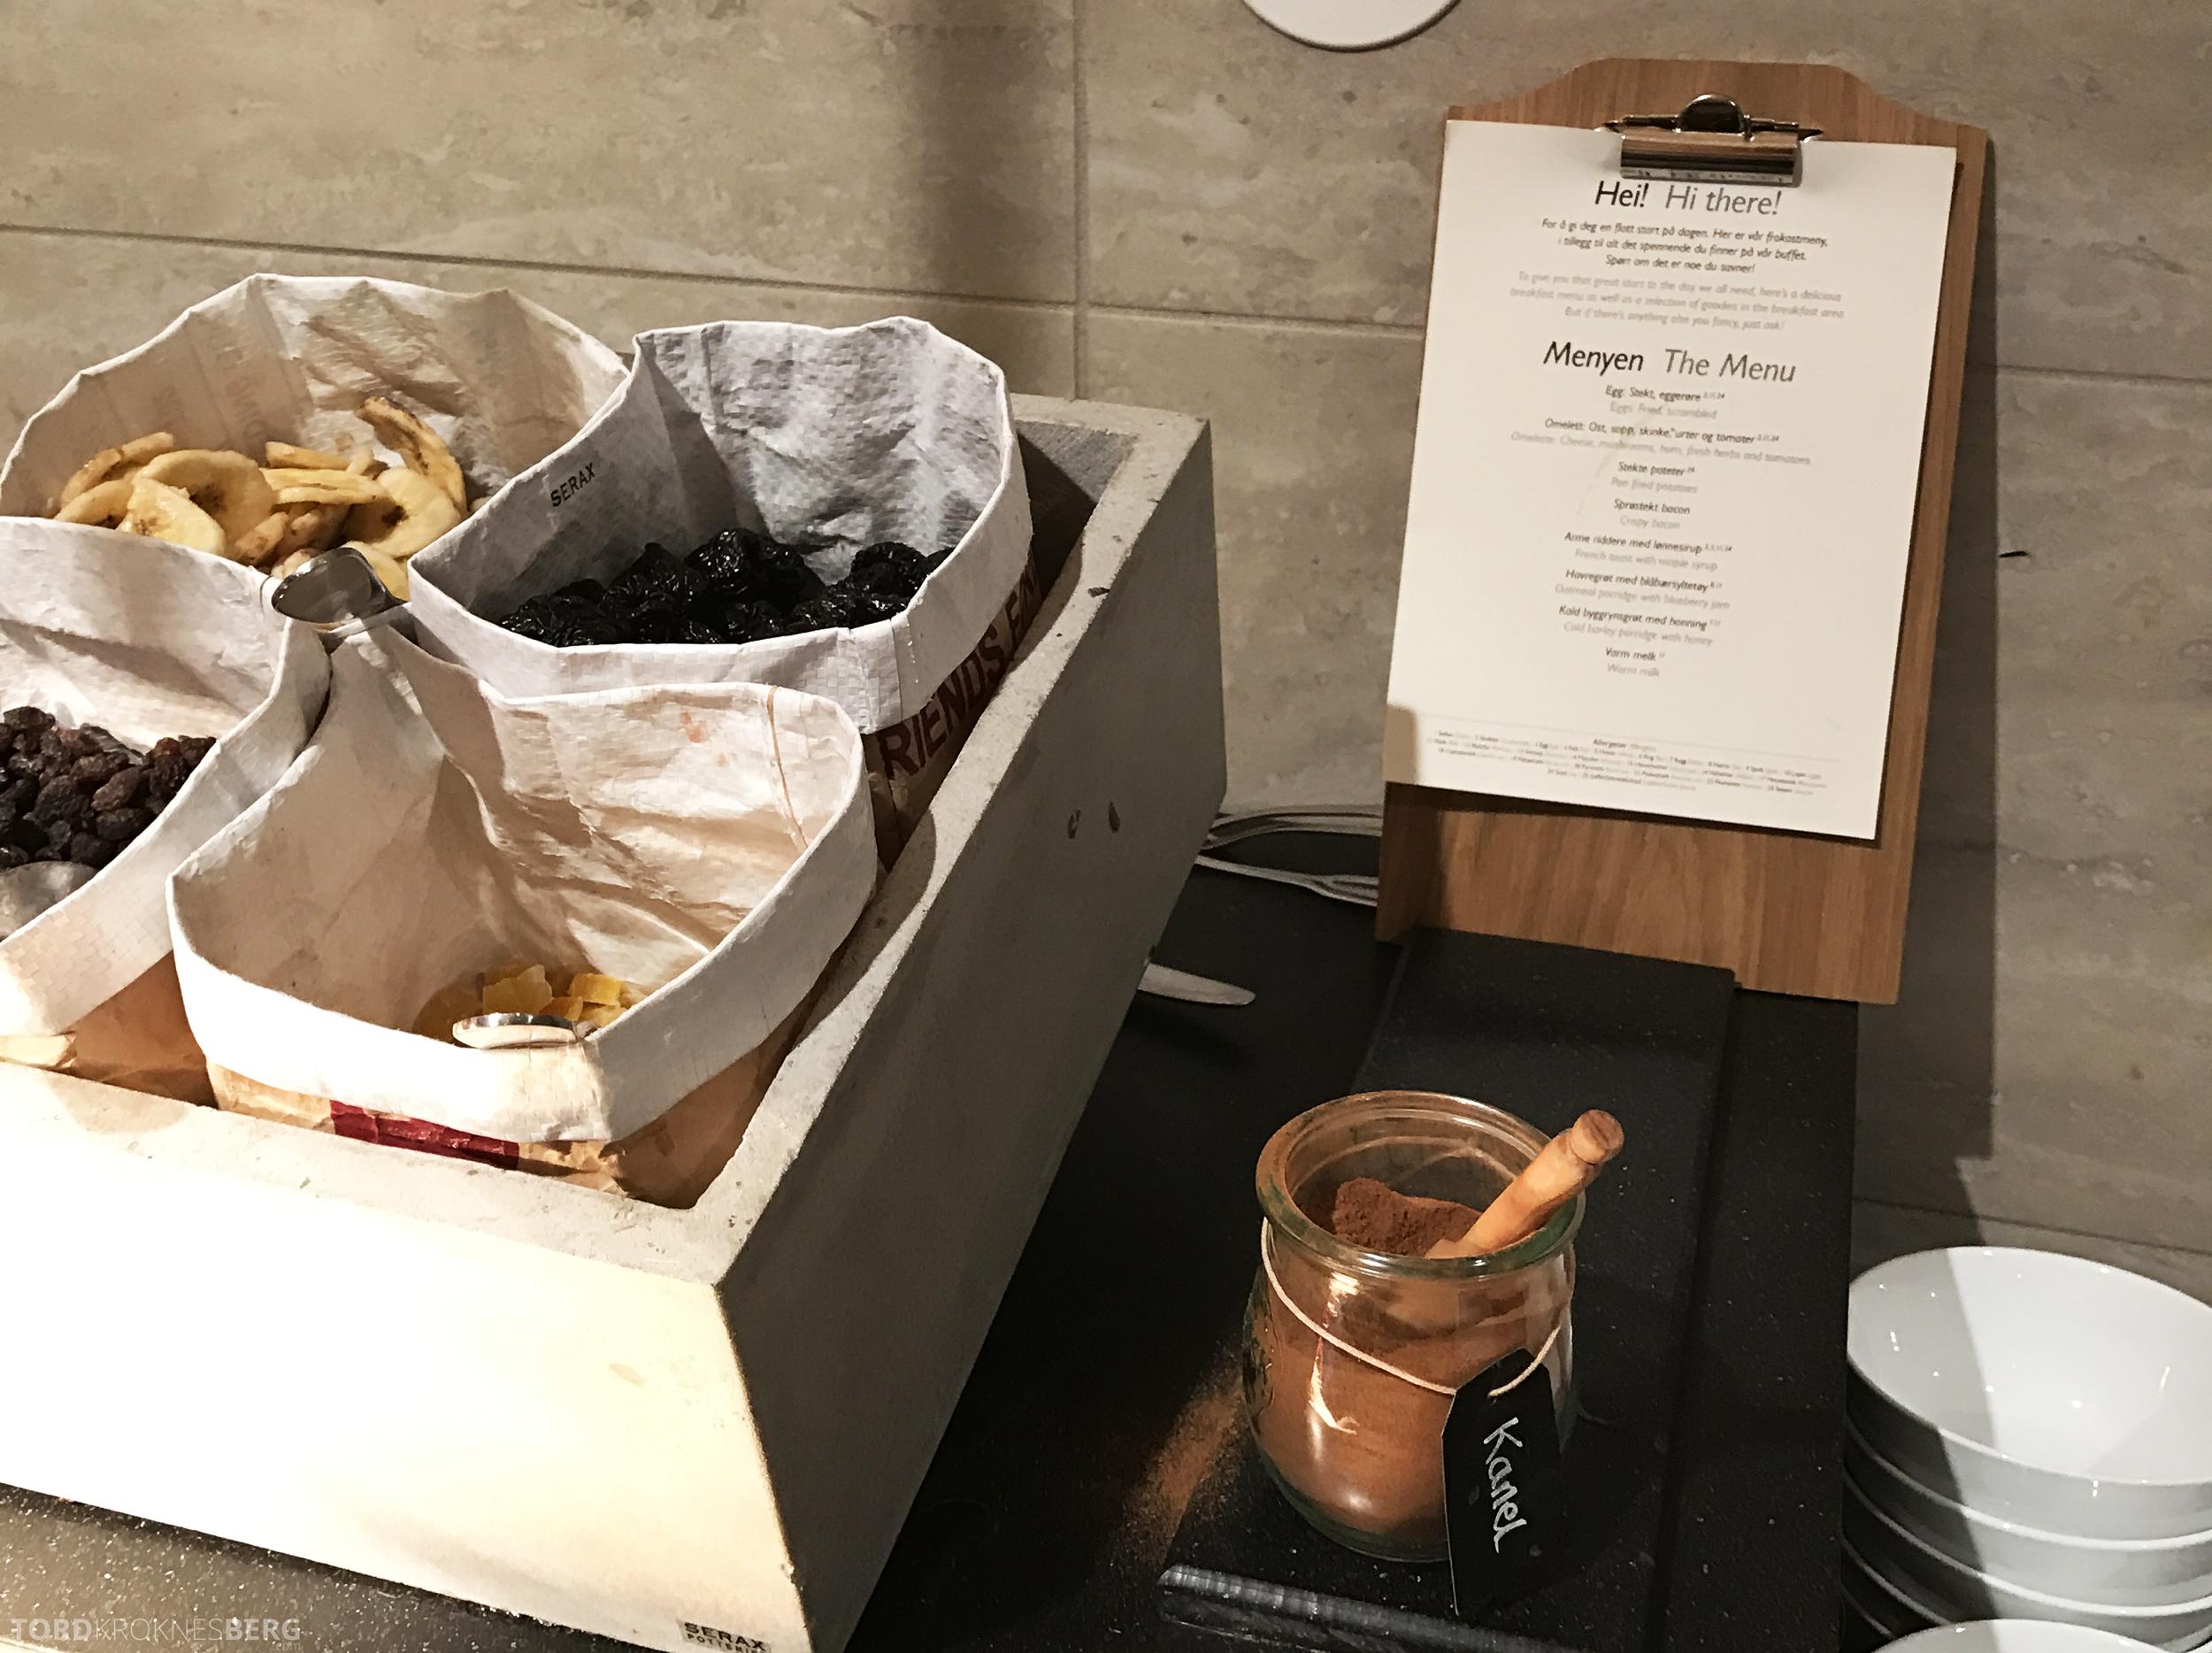 Radisson Blu Scandinavia Hotel frokostbuffet meny